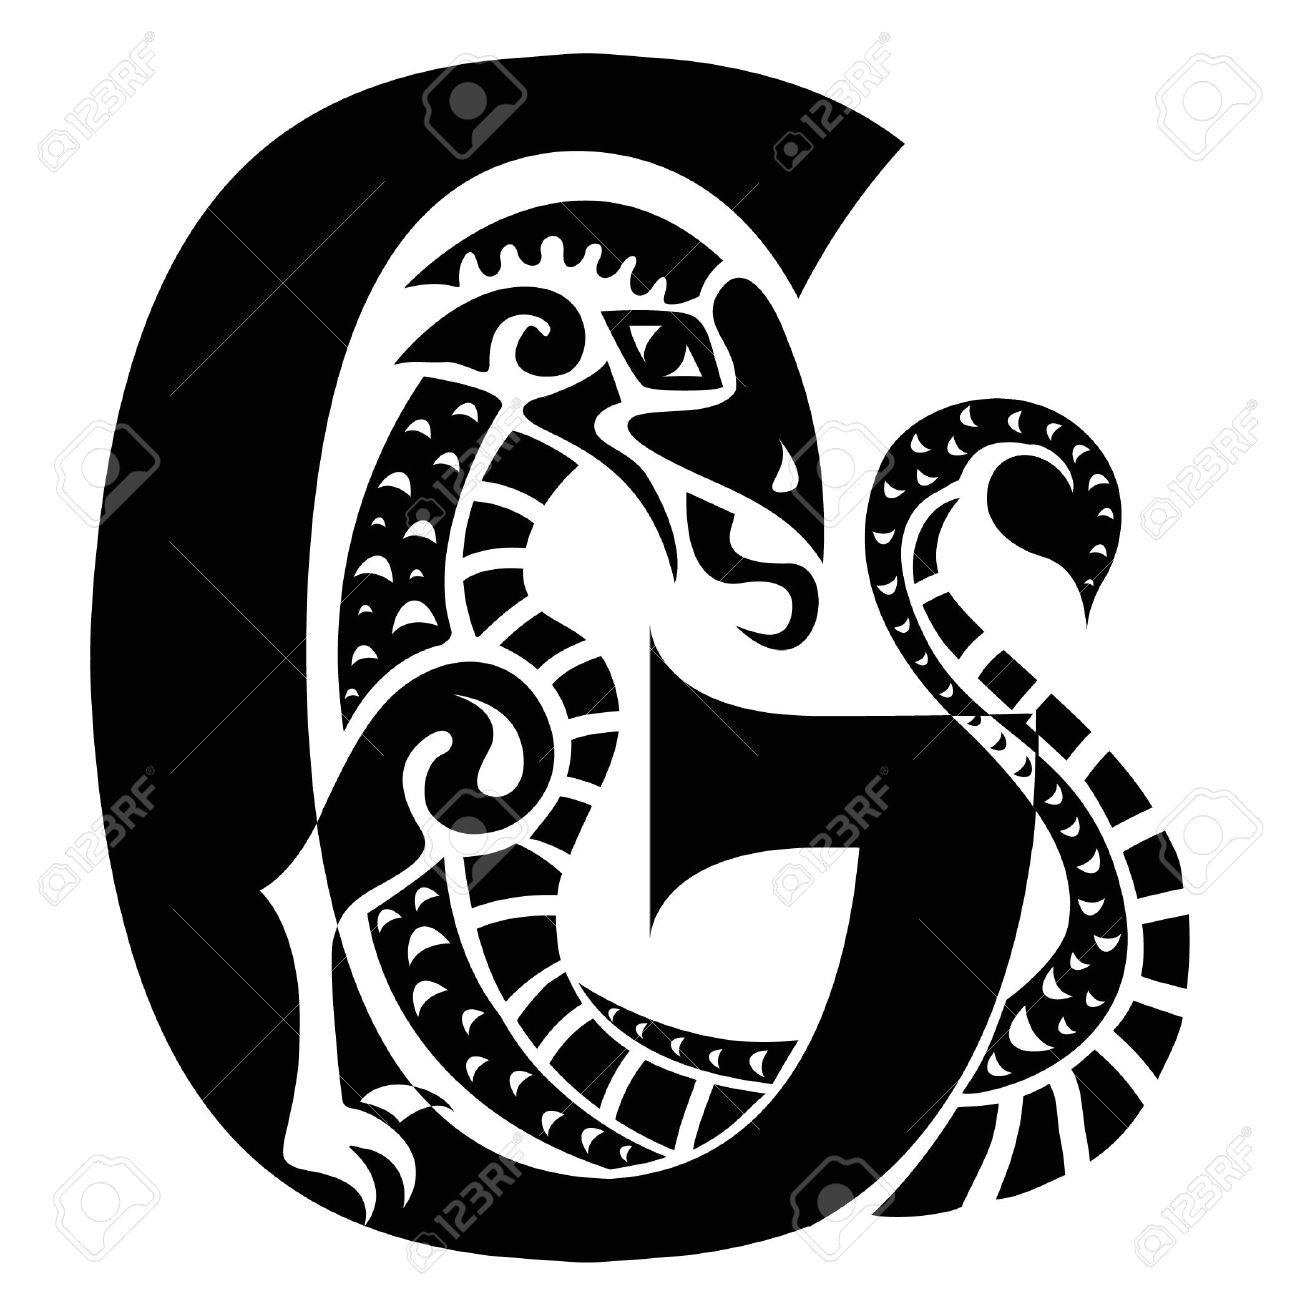 gargoyle capital letter G Stock Vector - 19759124